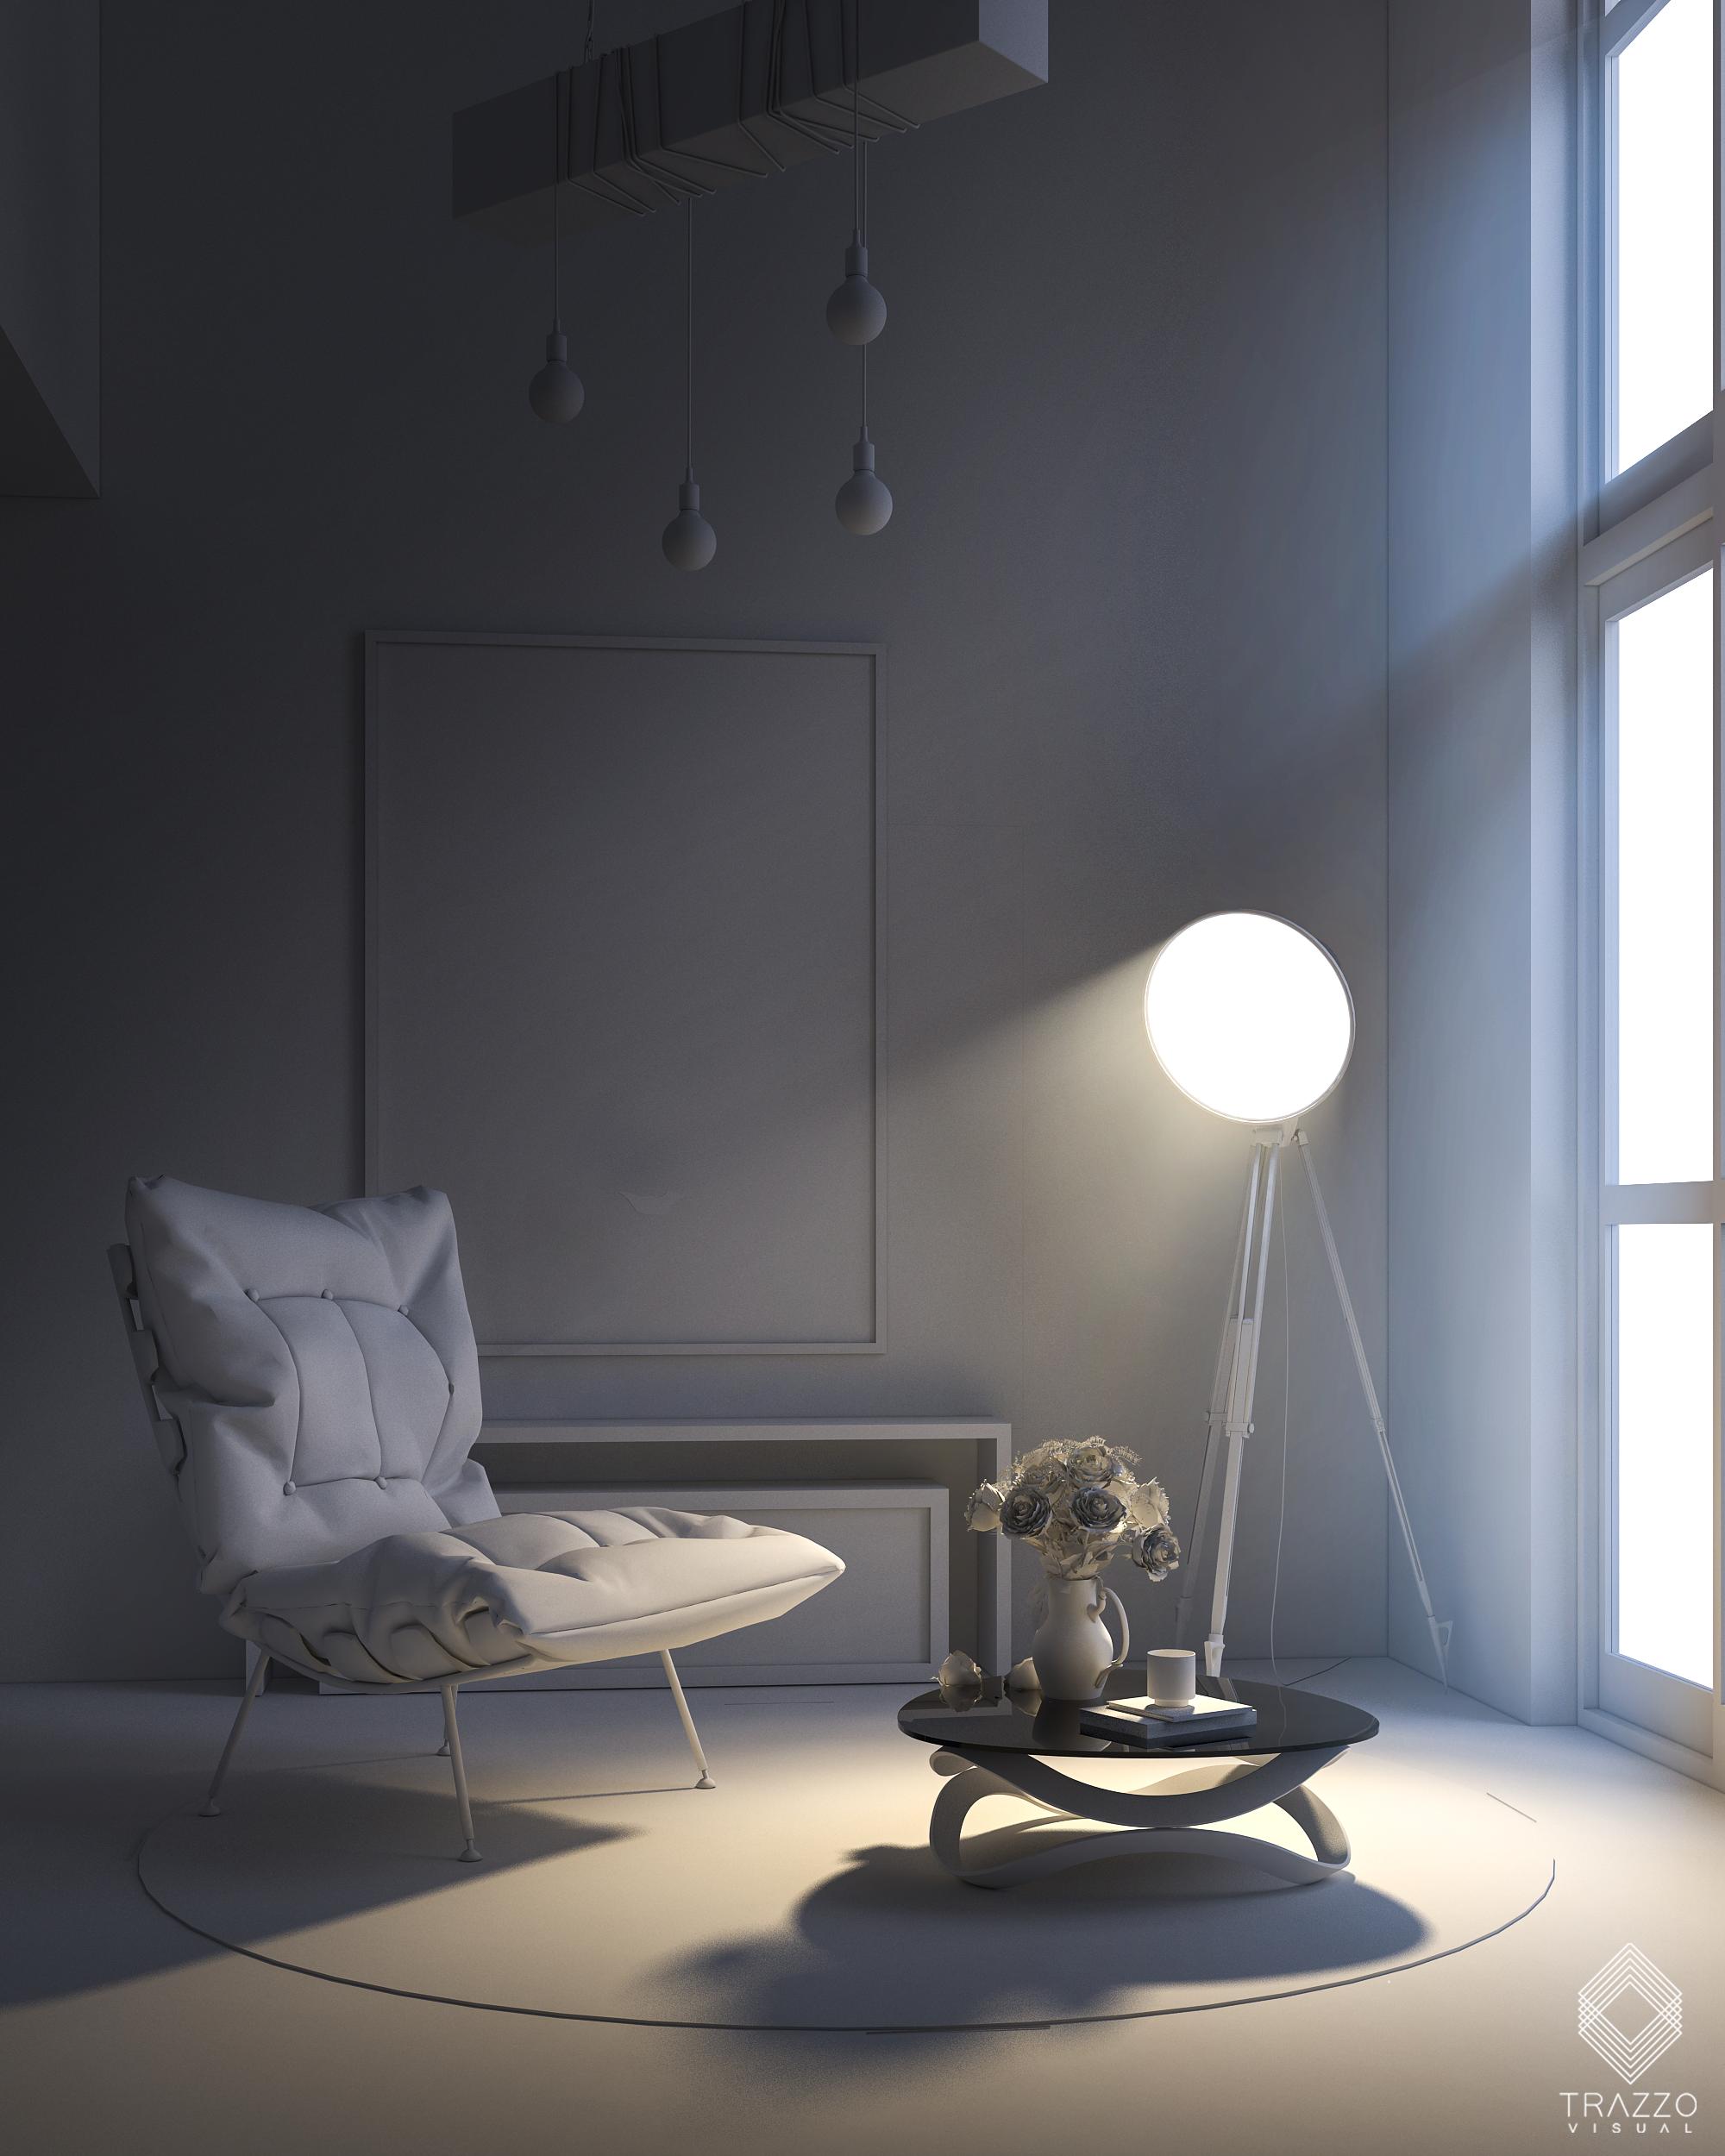 Prueba Iluminacion Skp + Vray